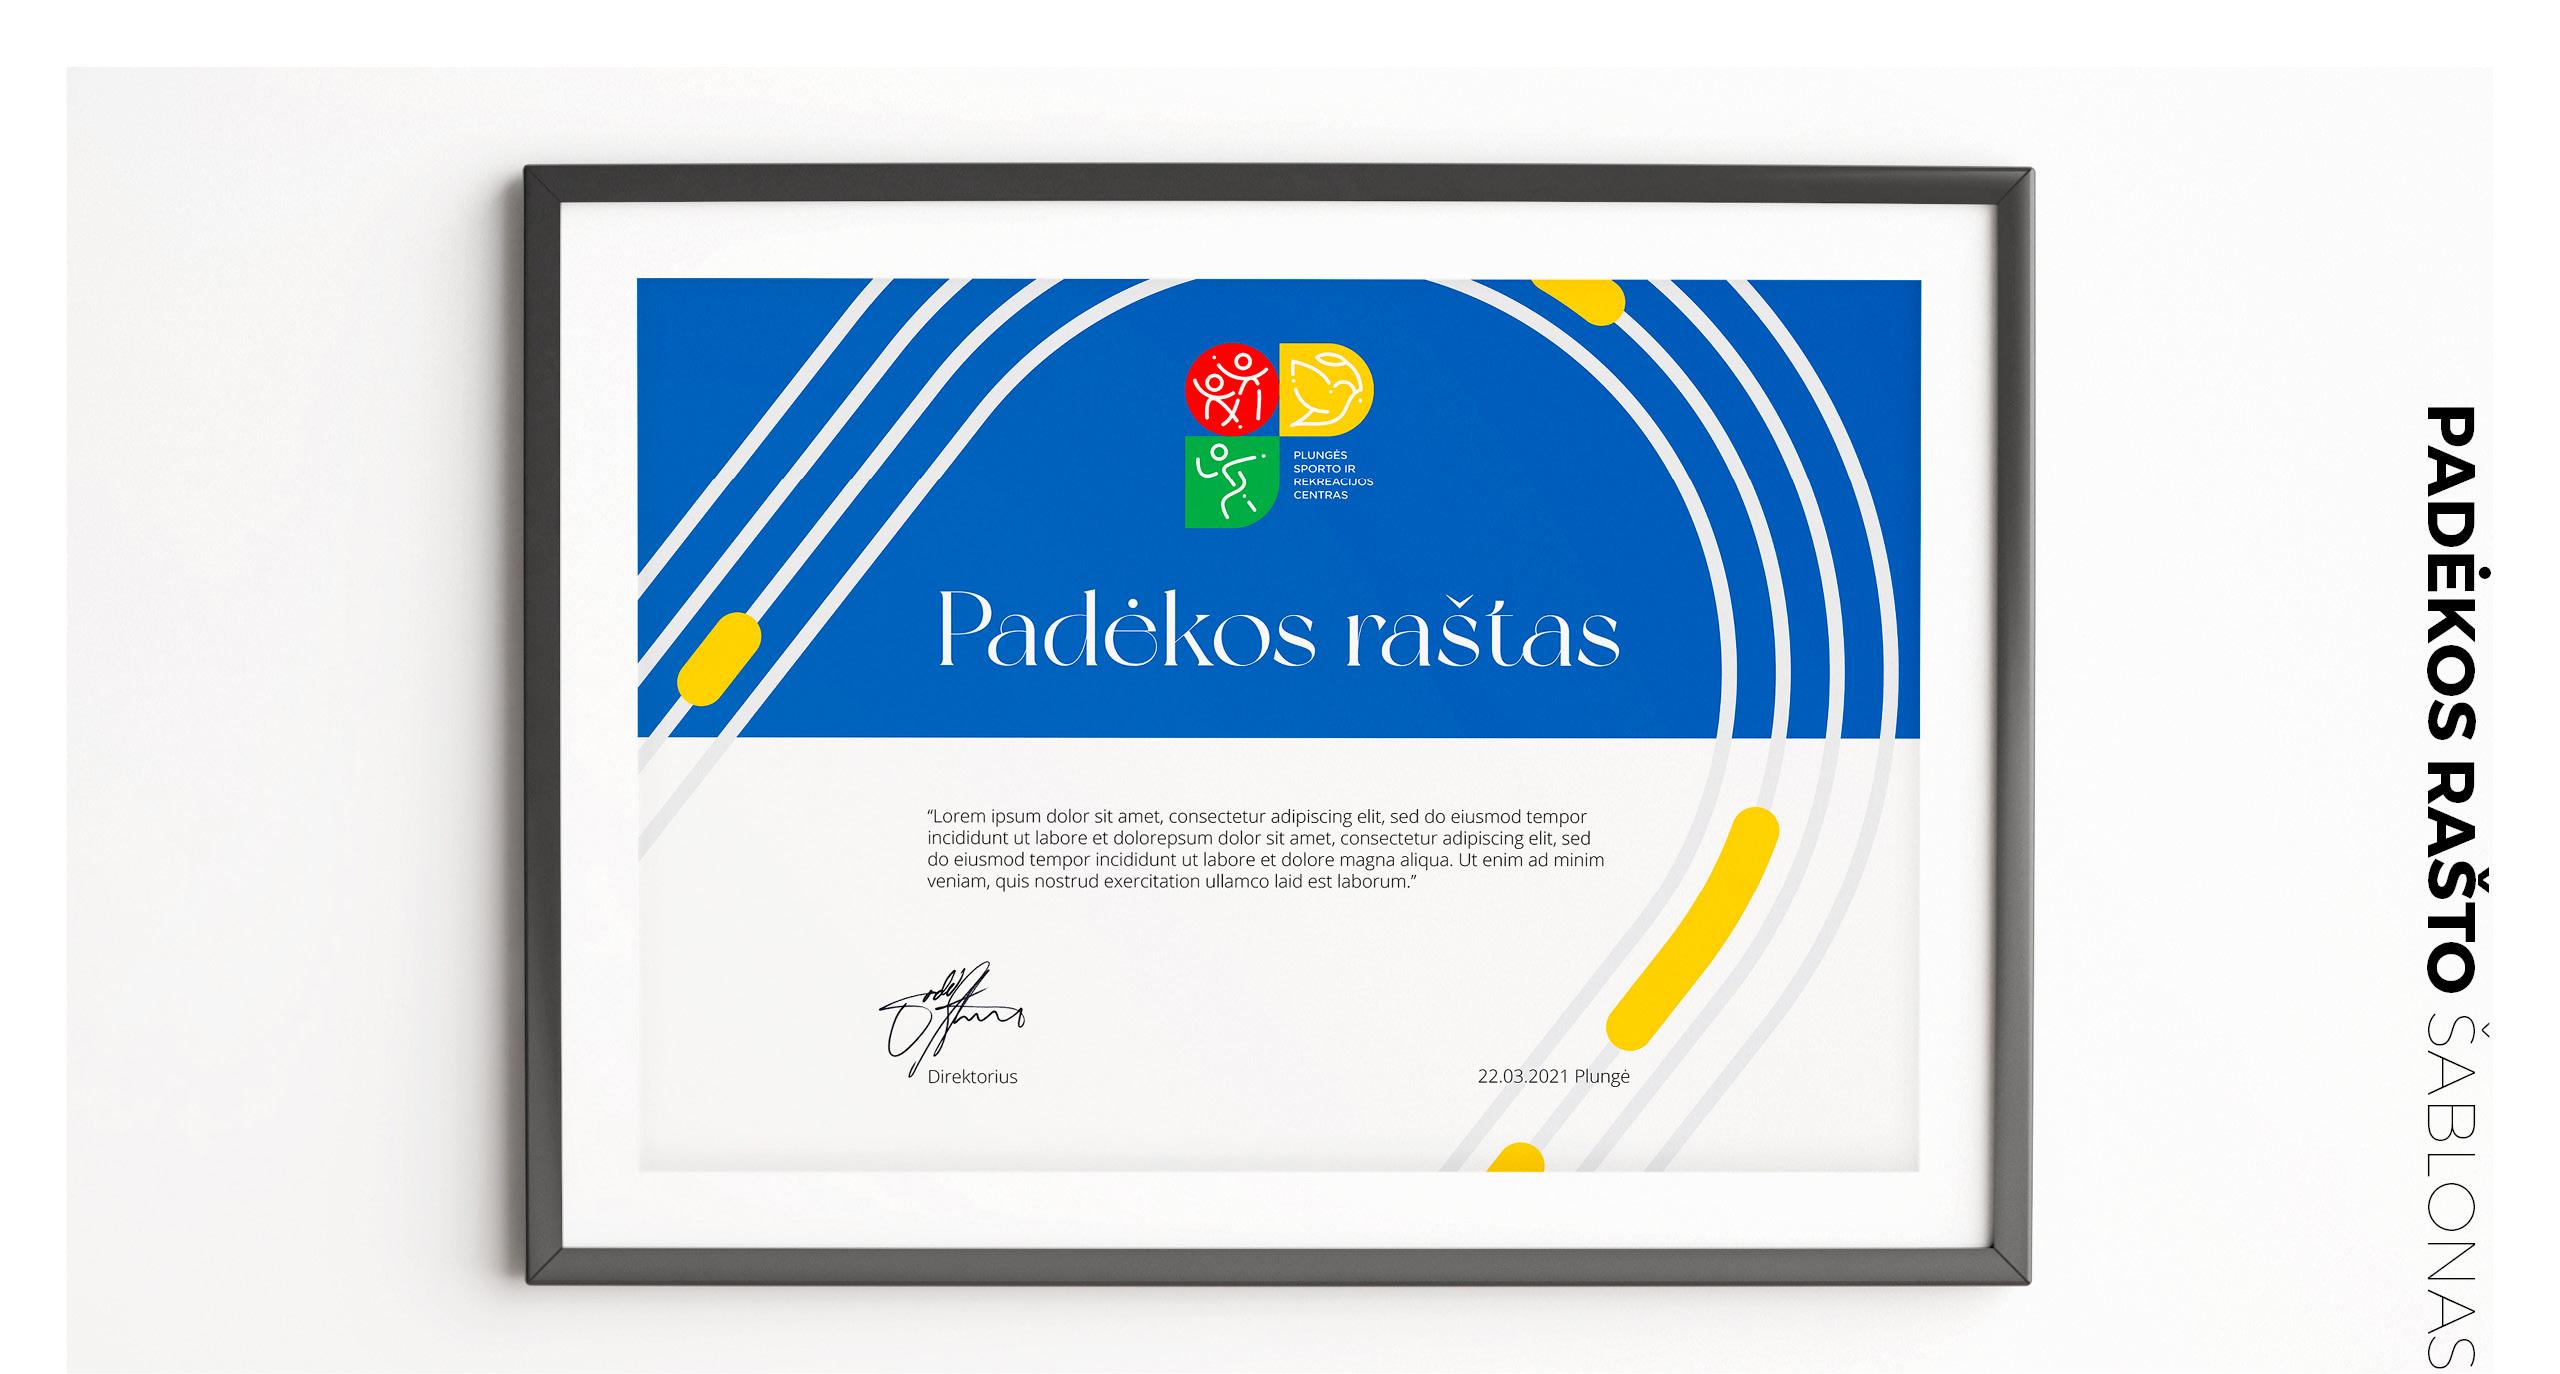 Plunges SRC branding - Logobou Design 19